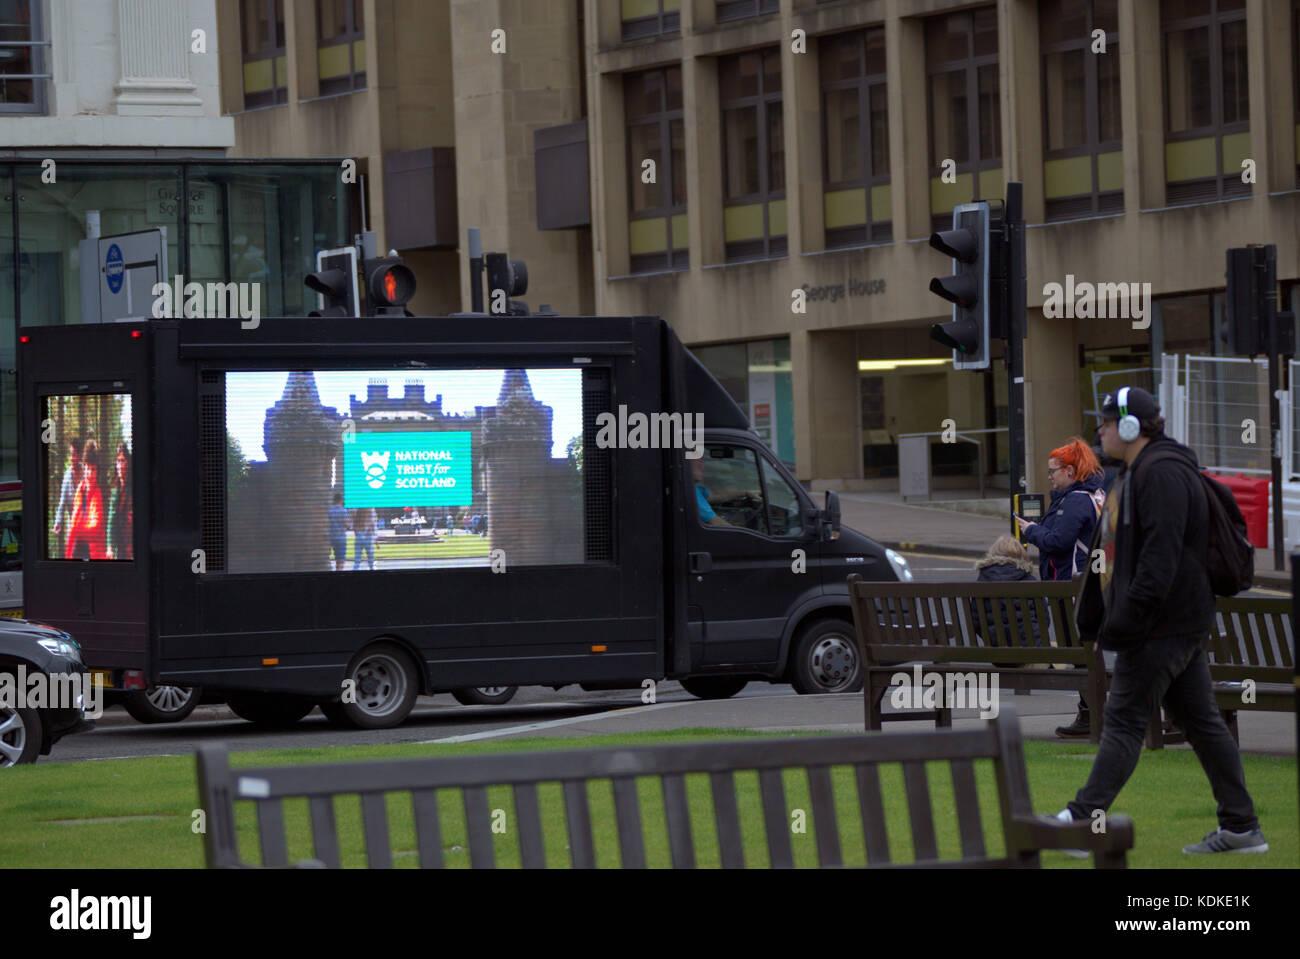 Glasgow, Scotland, UK.14th October. Glaswegians were surprised today as a multisided Promodigital Van video advert - Stock Image